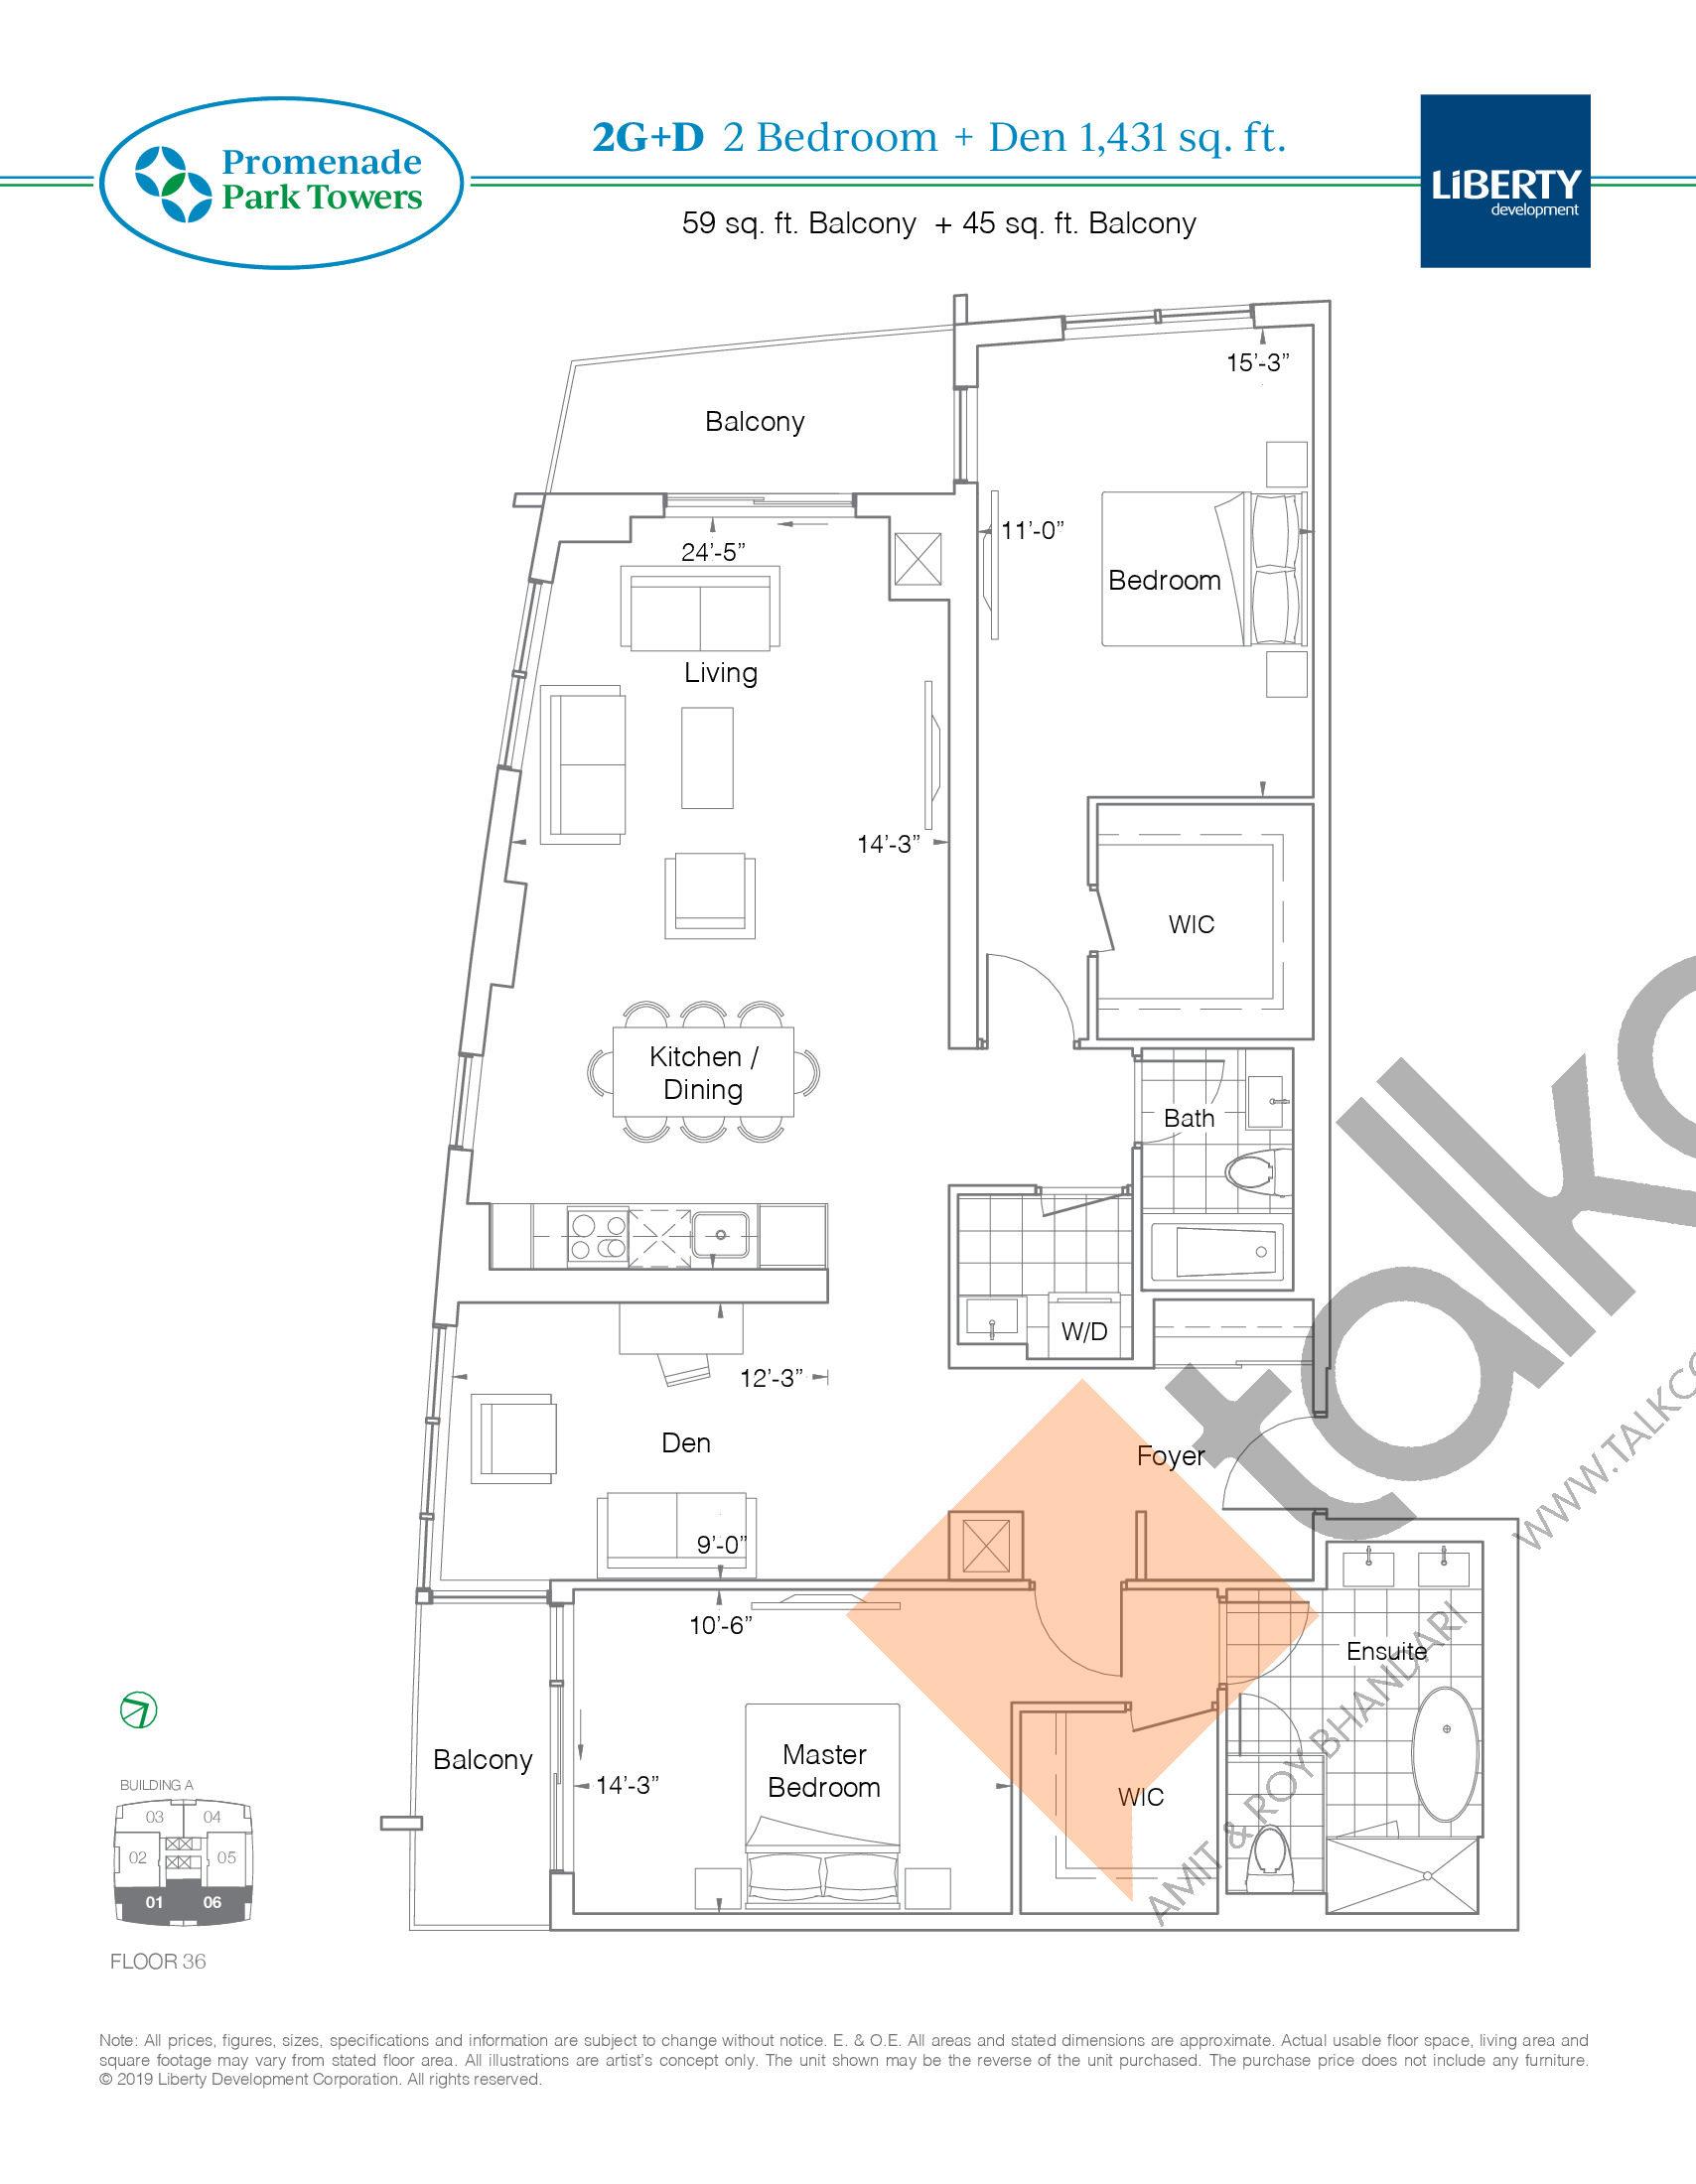 2G+D Floor Plan at Promenade Park Towers Condos - 1431 sq.ft